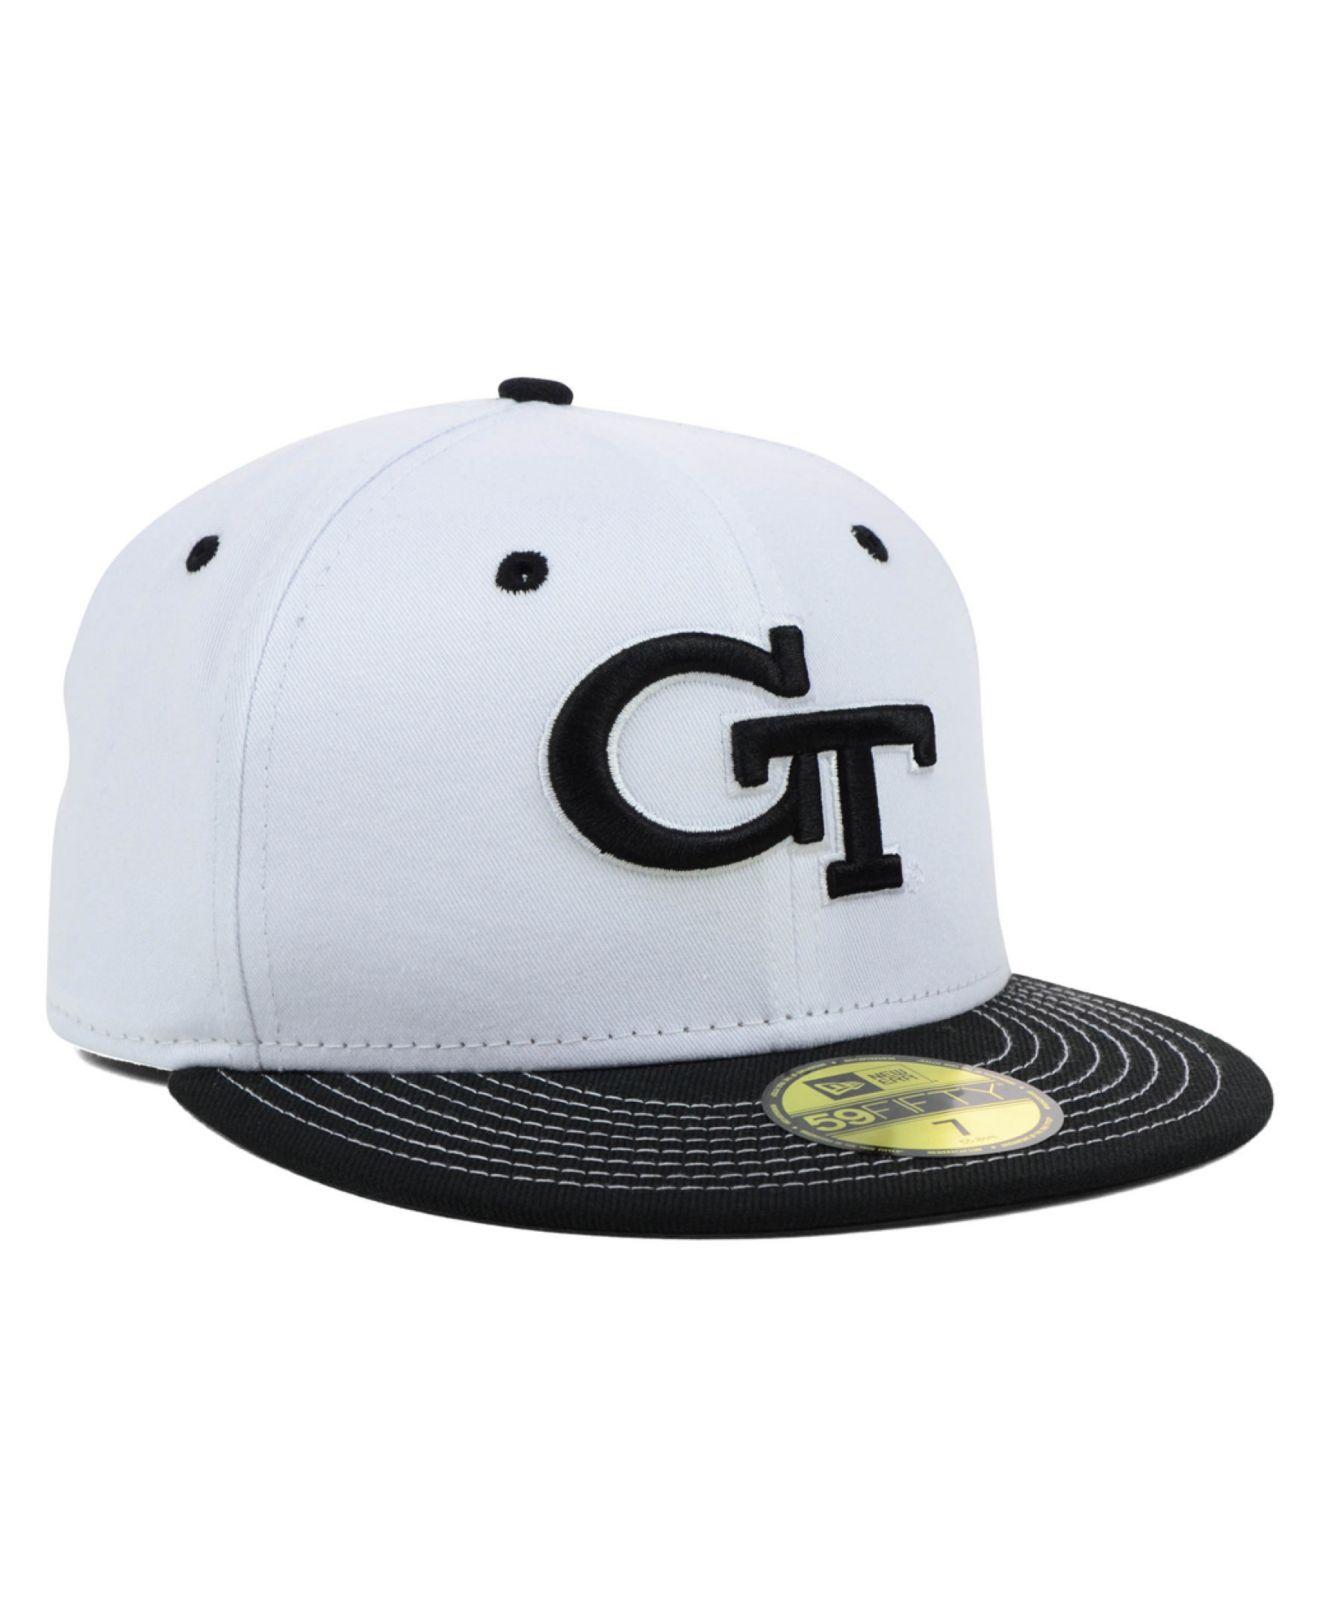 huge discount 99e95 08ca7 Lyst - KTZ Georgia Tech Yellow Jackets Ncaa White Black 59fifty Cap ...